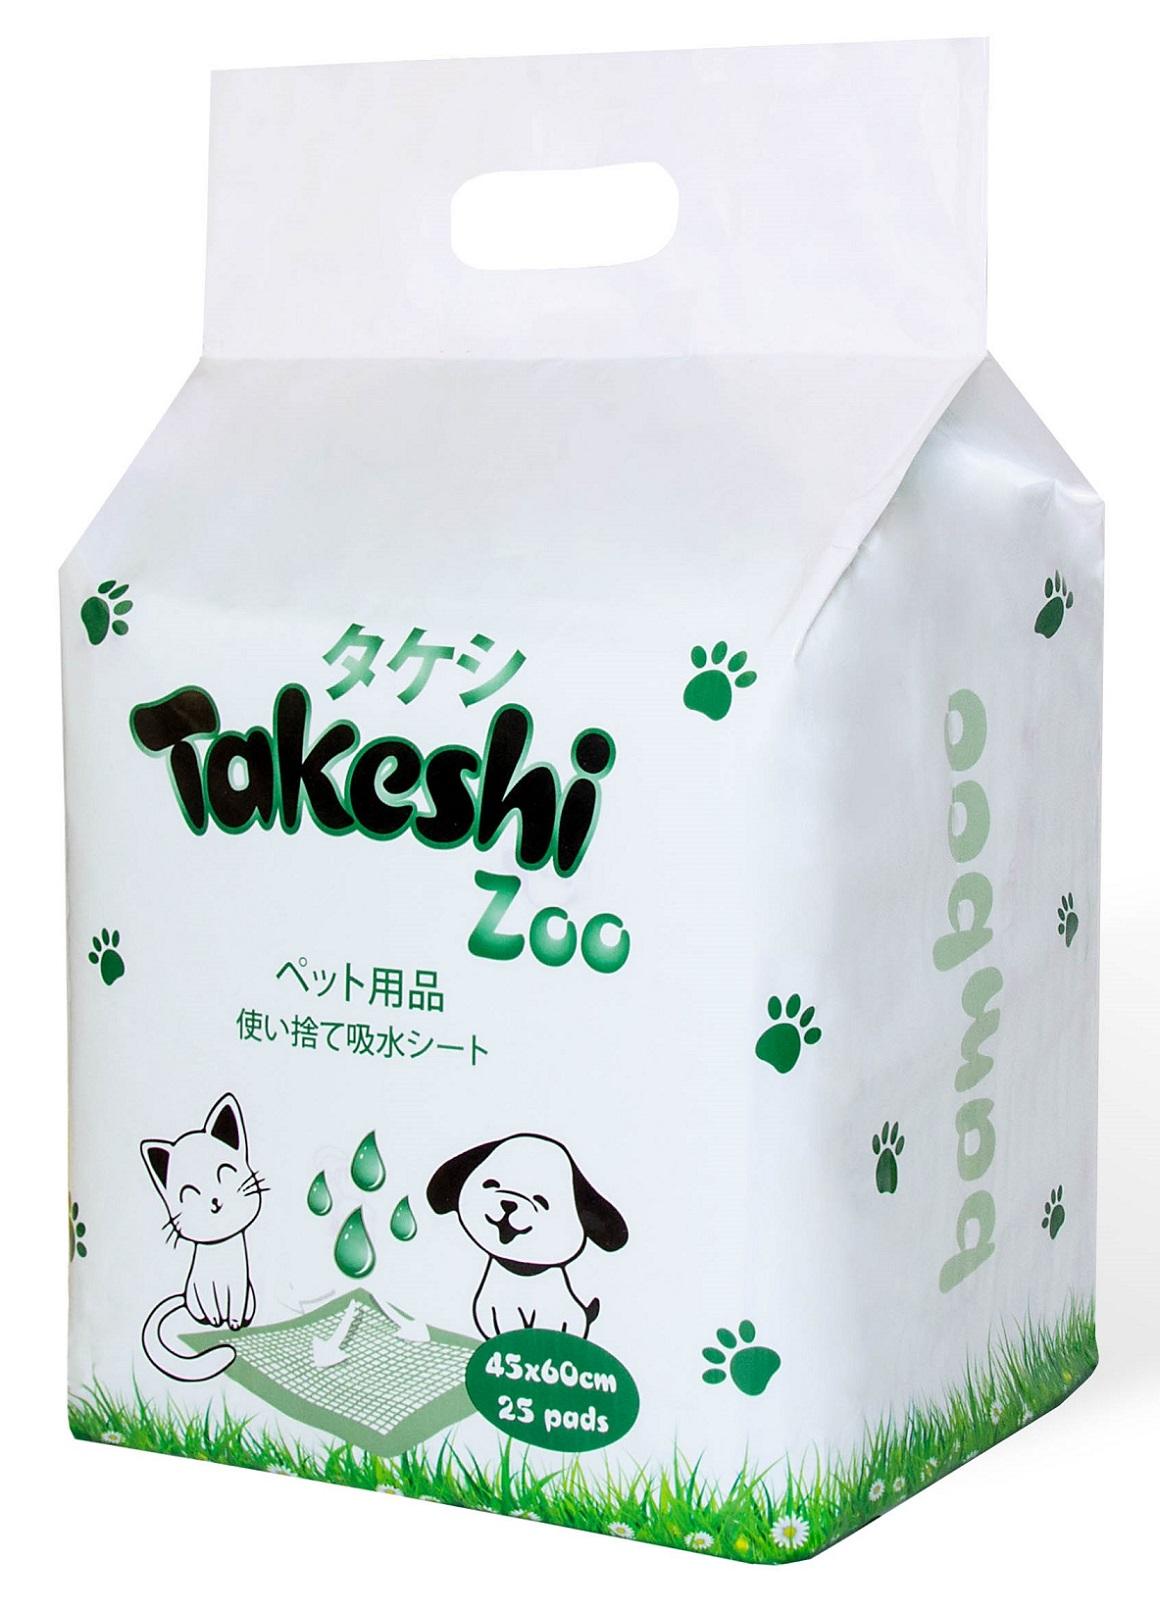 Пеленки для животных Takeshi Zoo Bamboo, гелевые